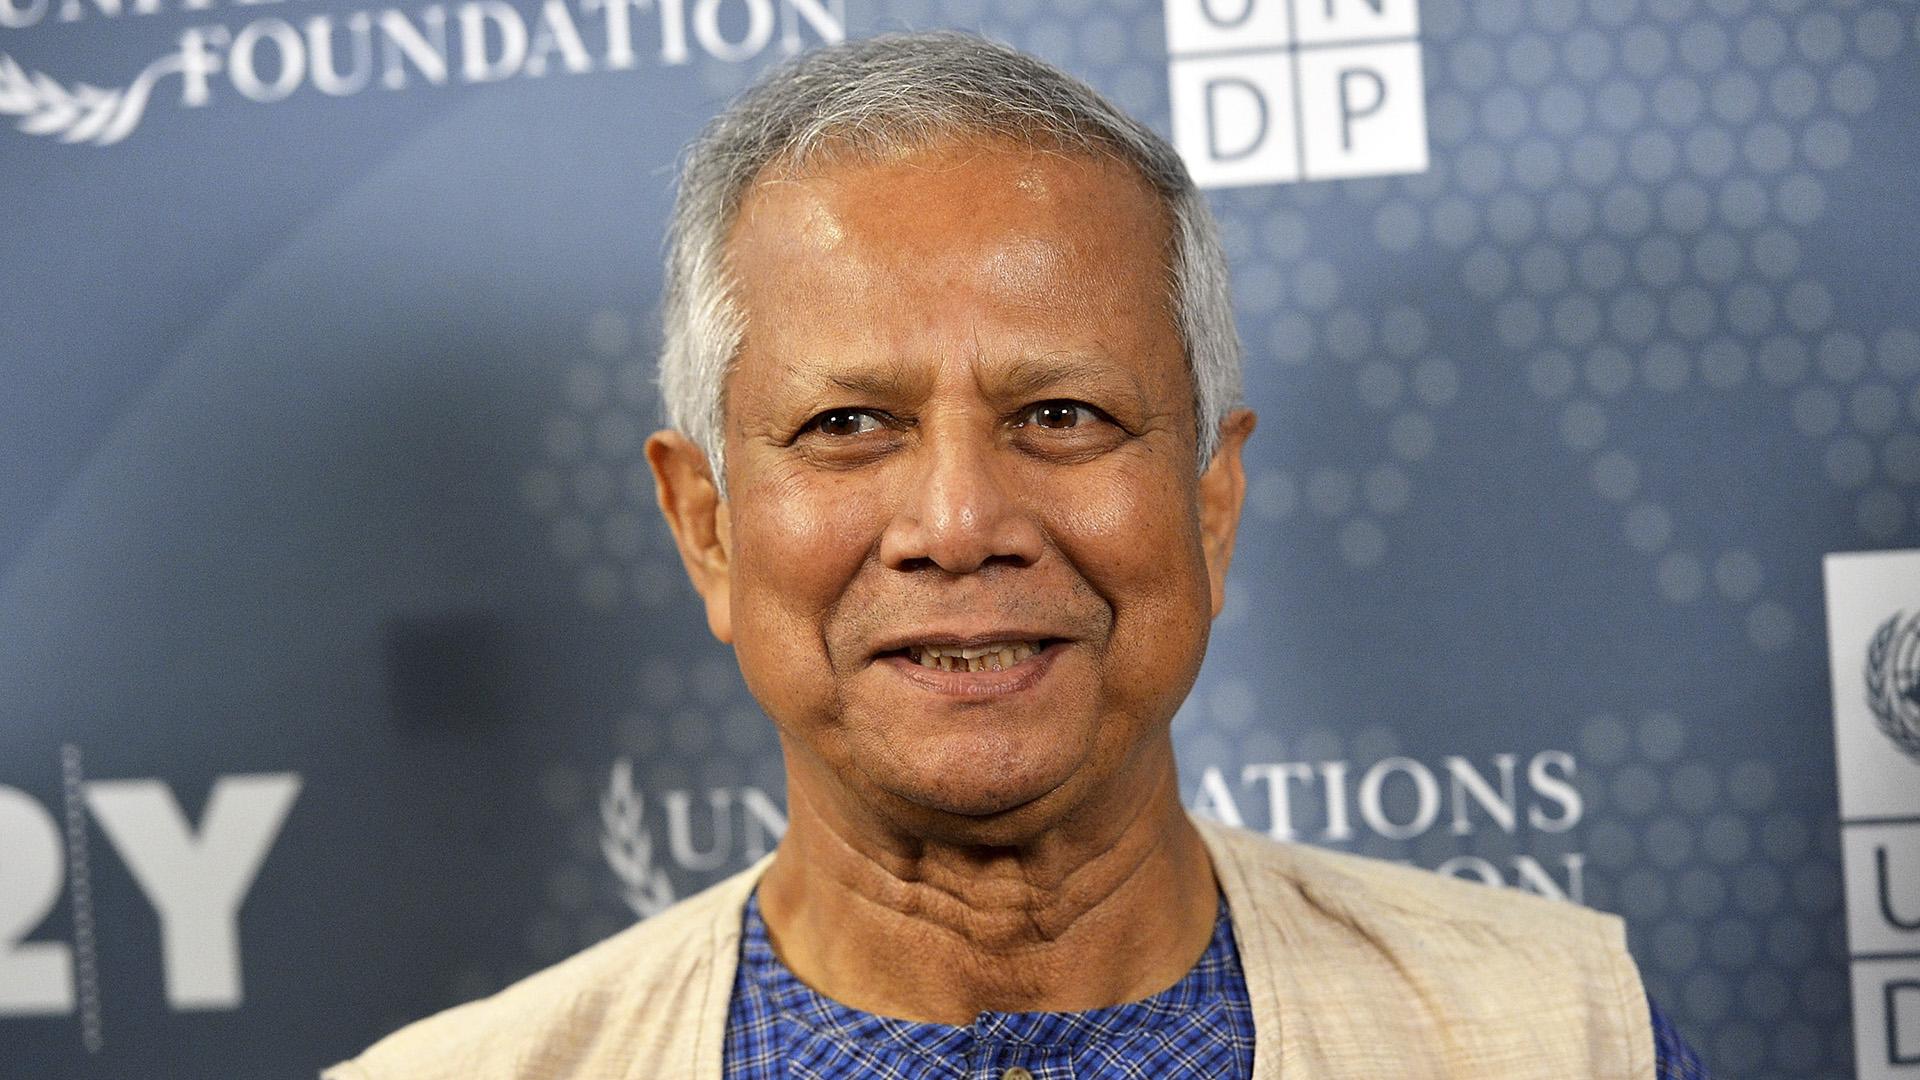 Bangladesh Nobel laureate Muhammad Yunus to get Olympic Laurel | ஒலிம்பிக் லாரலைப் பெறுகிறார் பங்களாதேஷ் நோபல் பரிசு பெற்ற முஹம்மது யூனுஸ் |_40.1